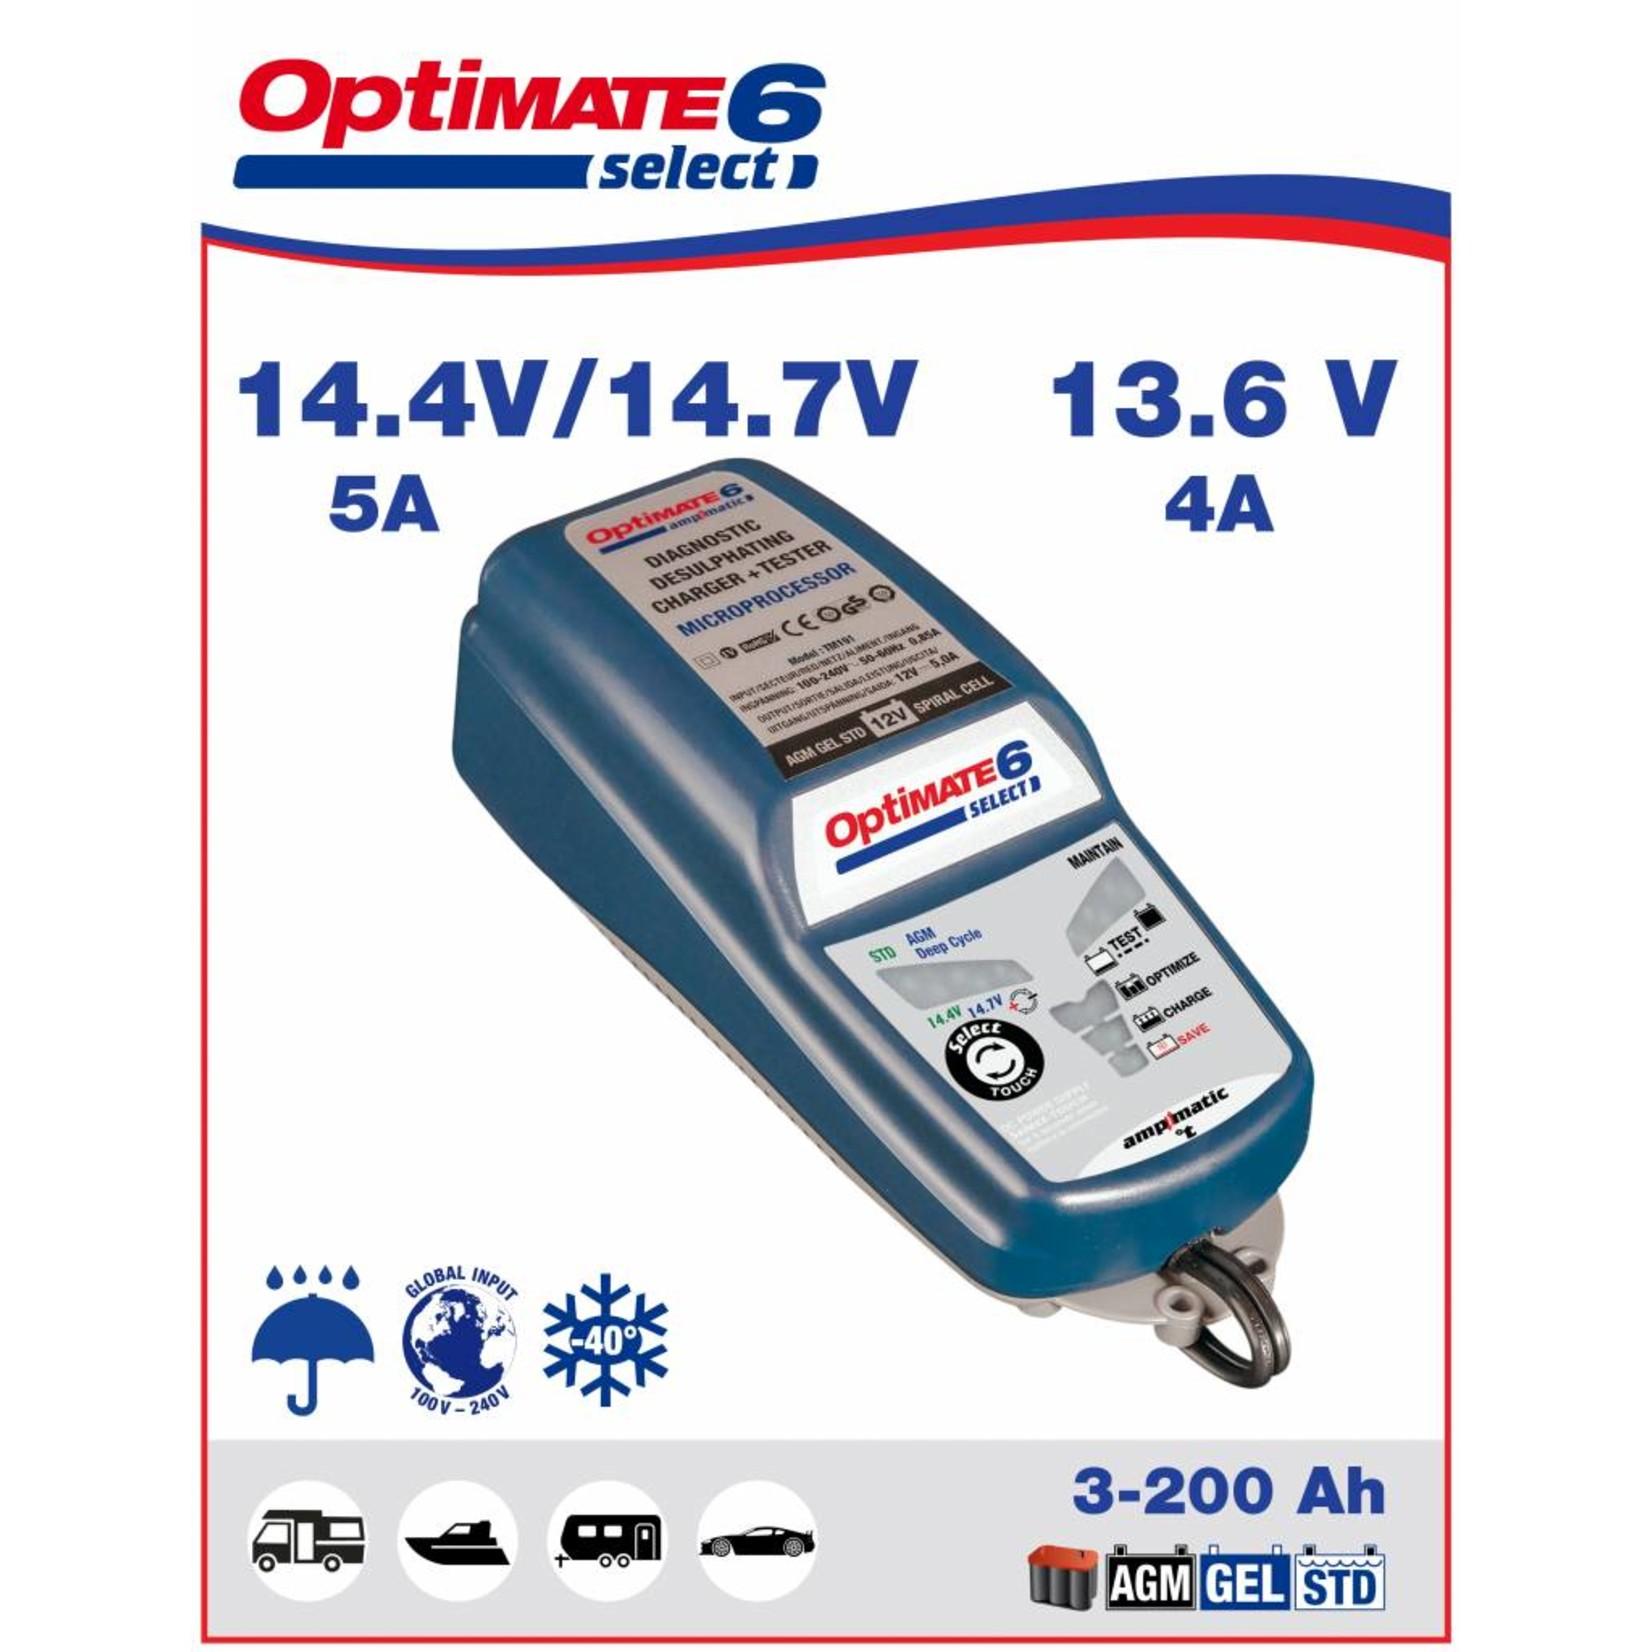 OptiMate OptiMate 6 Select - Battery Charger 12V